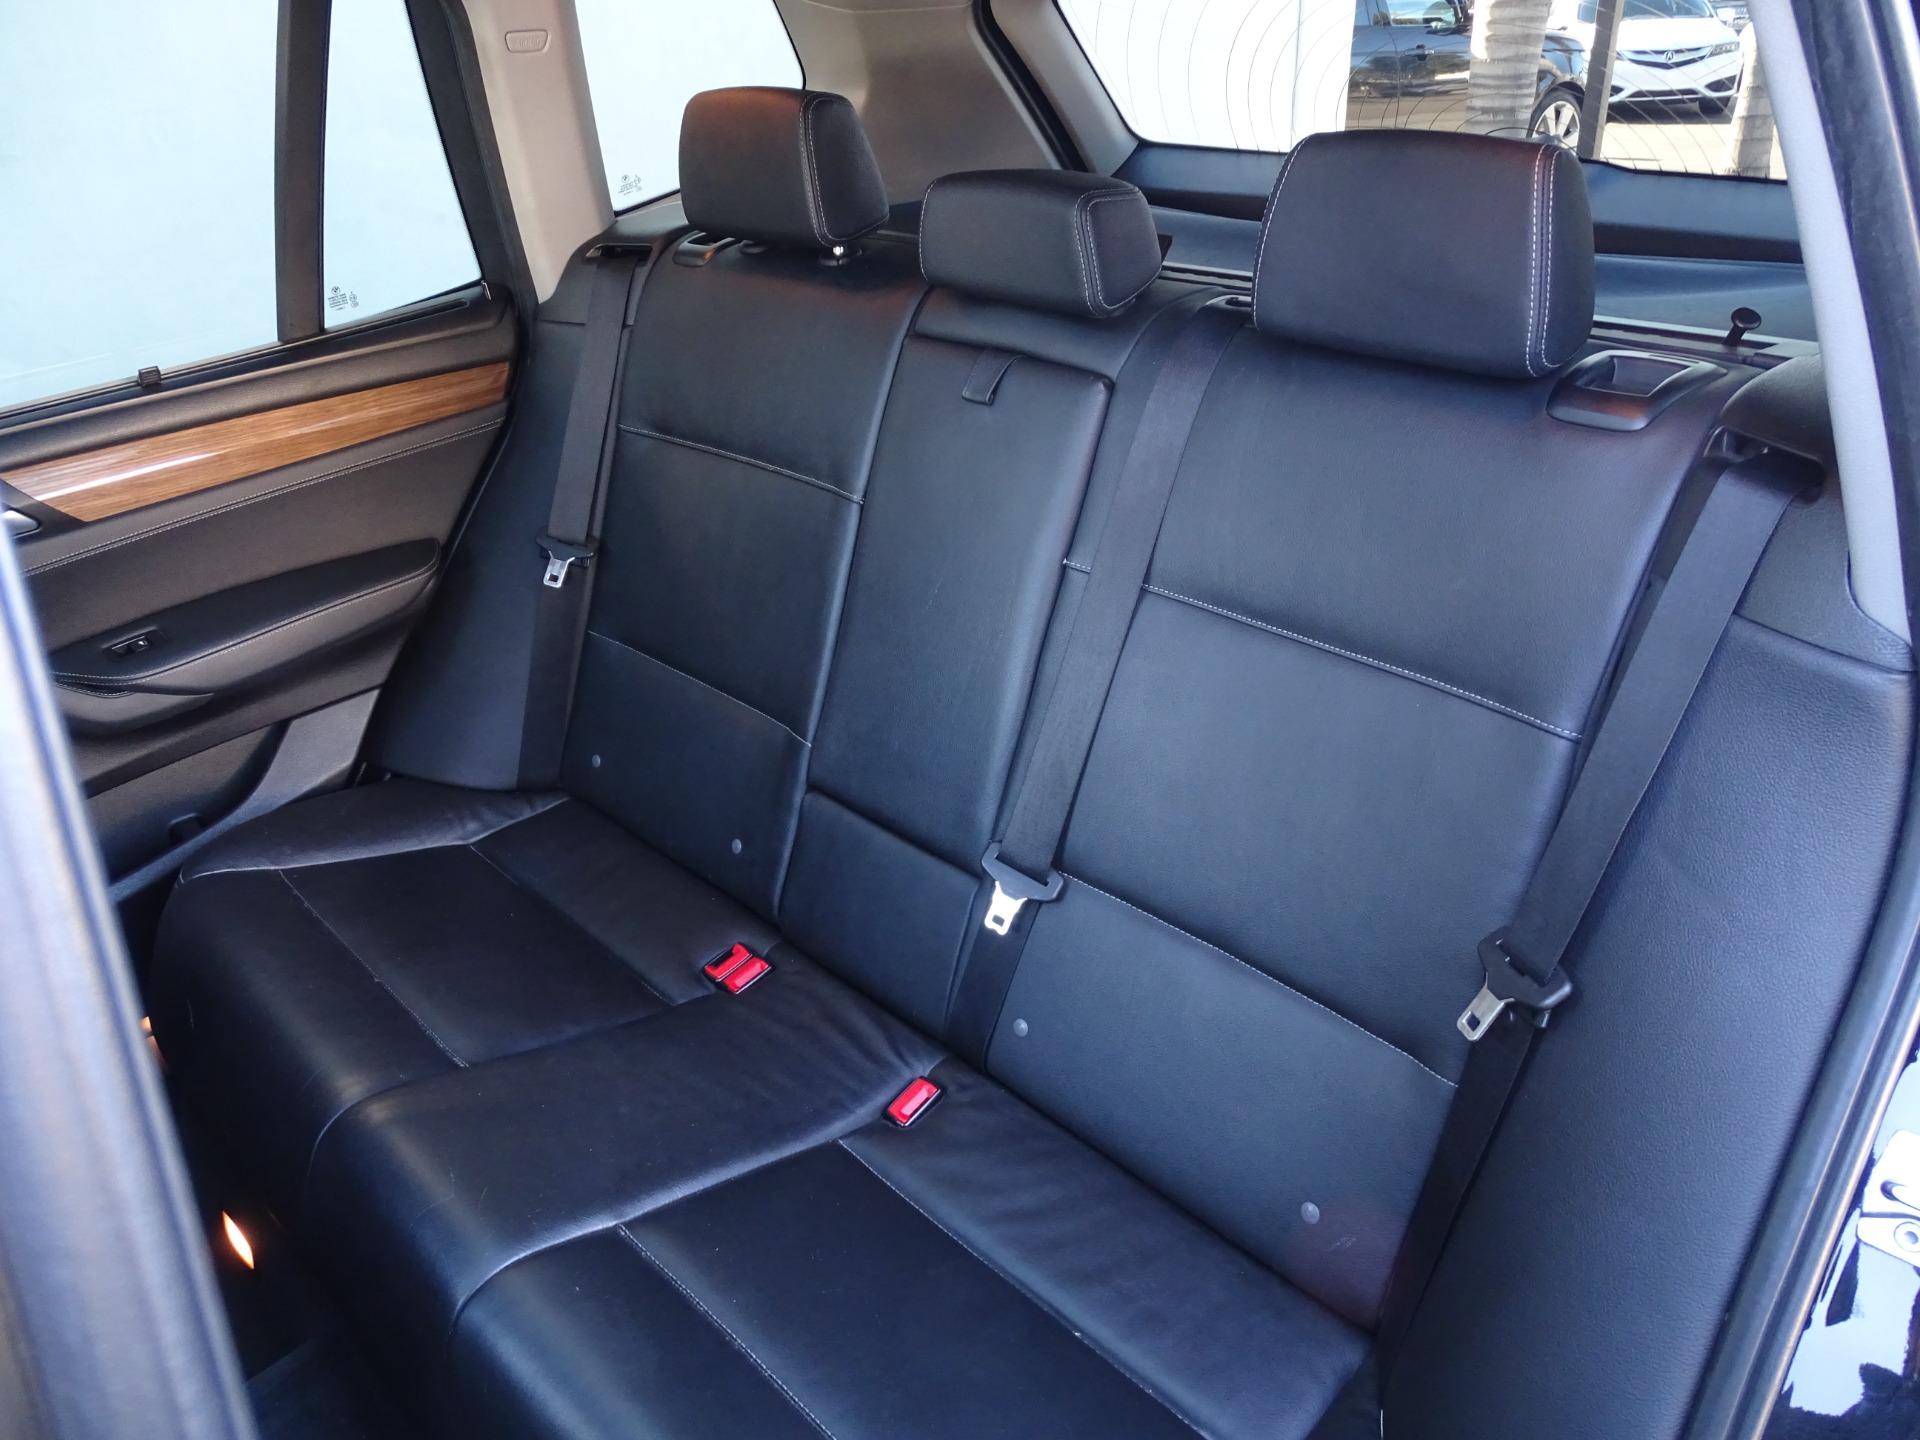 Used-2011-BMW-X3-xDrive28i-**-MSRP-$53,165-**